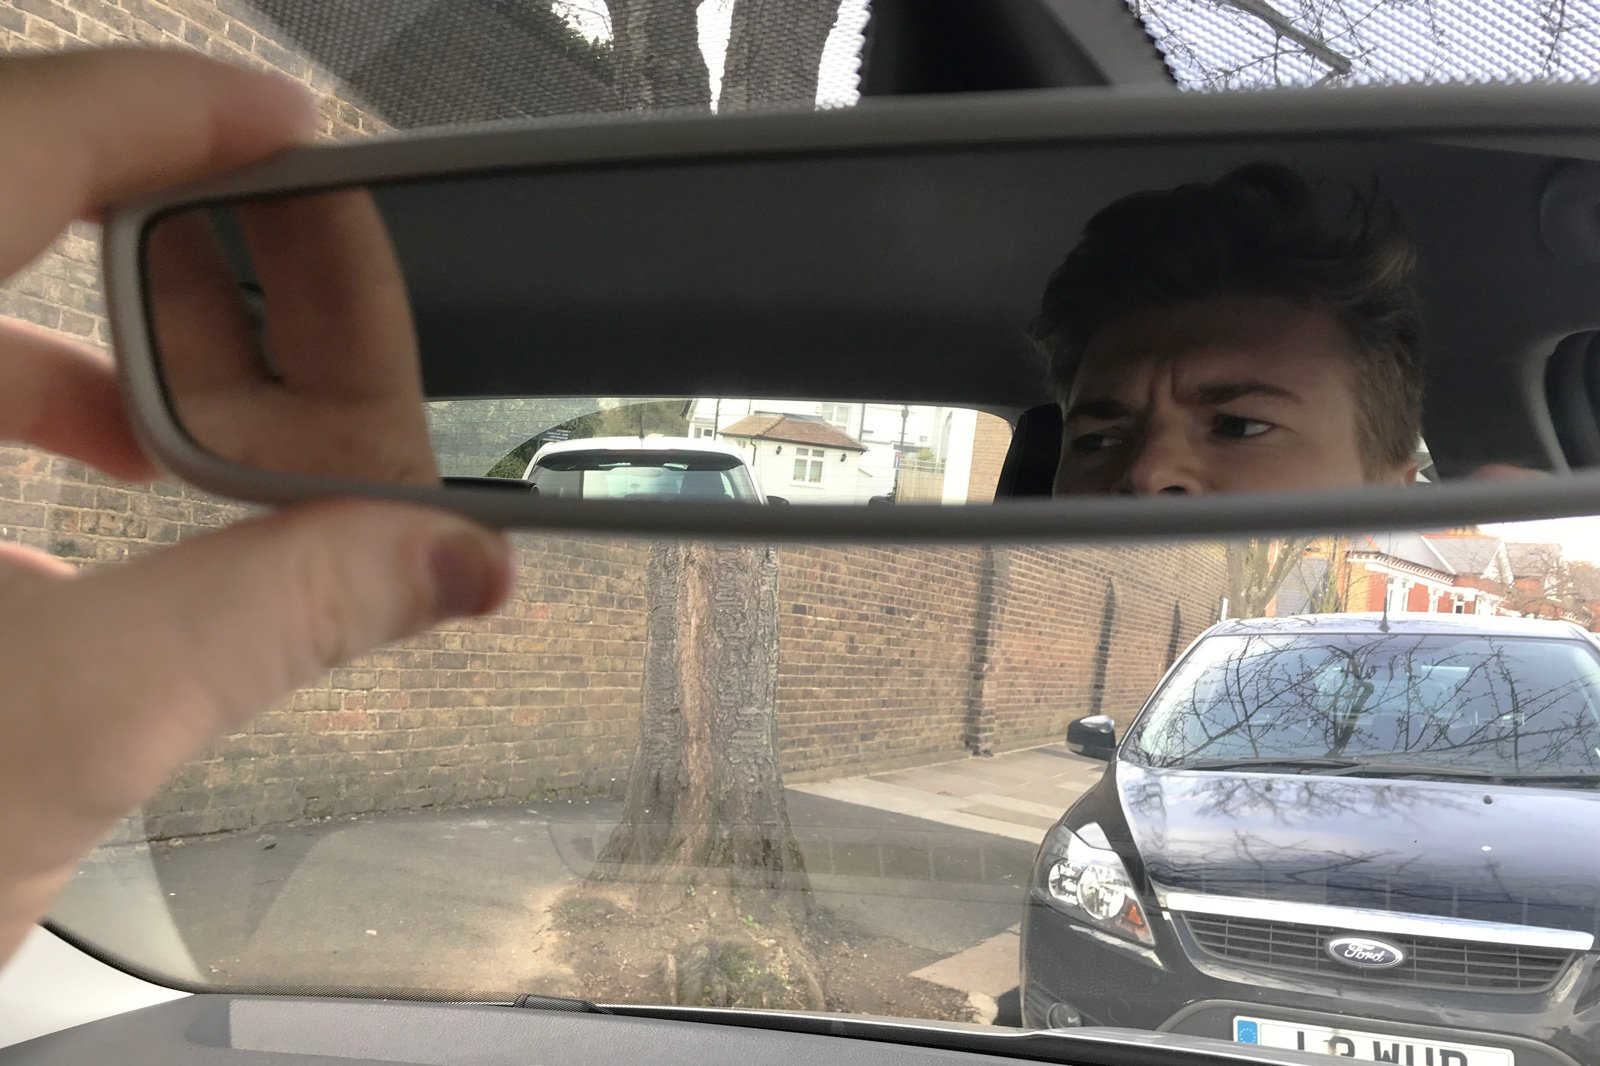 skoda fabia rear-view mirror